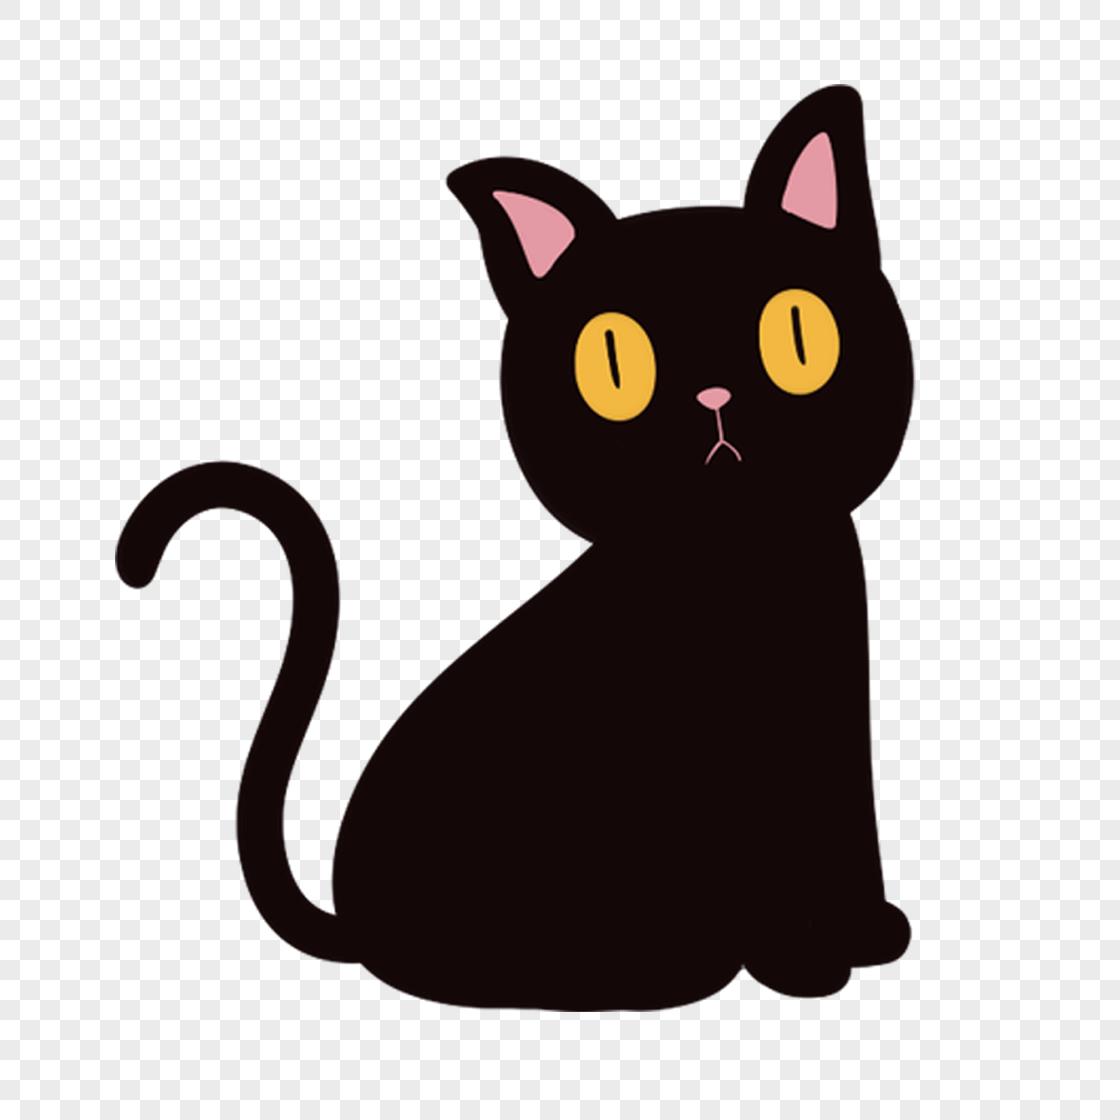 Kata Kata Bijak Gambar Kartun Kucing Kata Kata Cinta